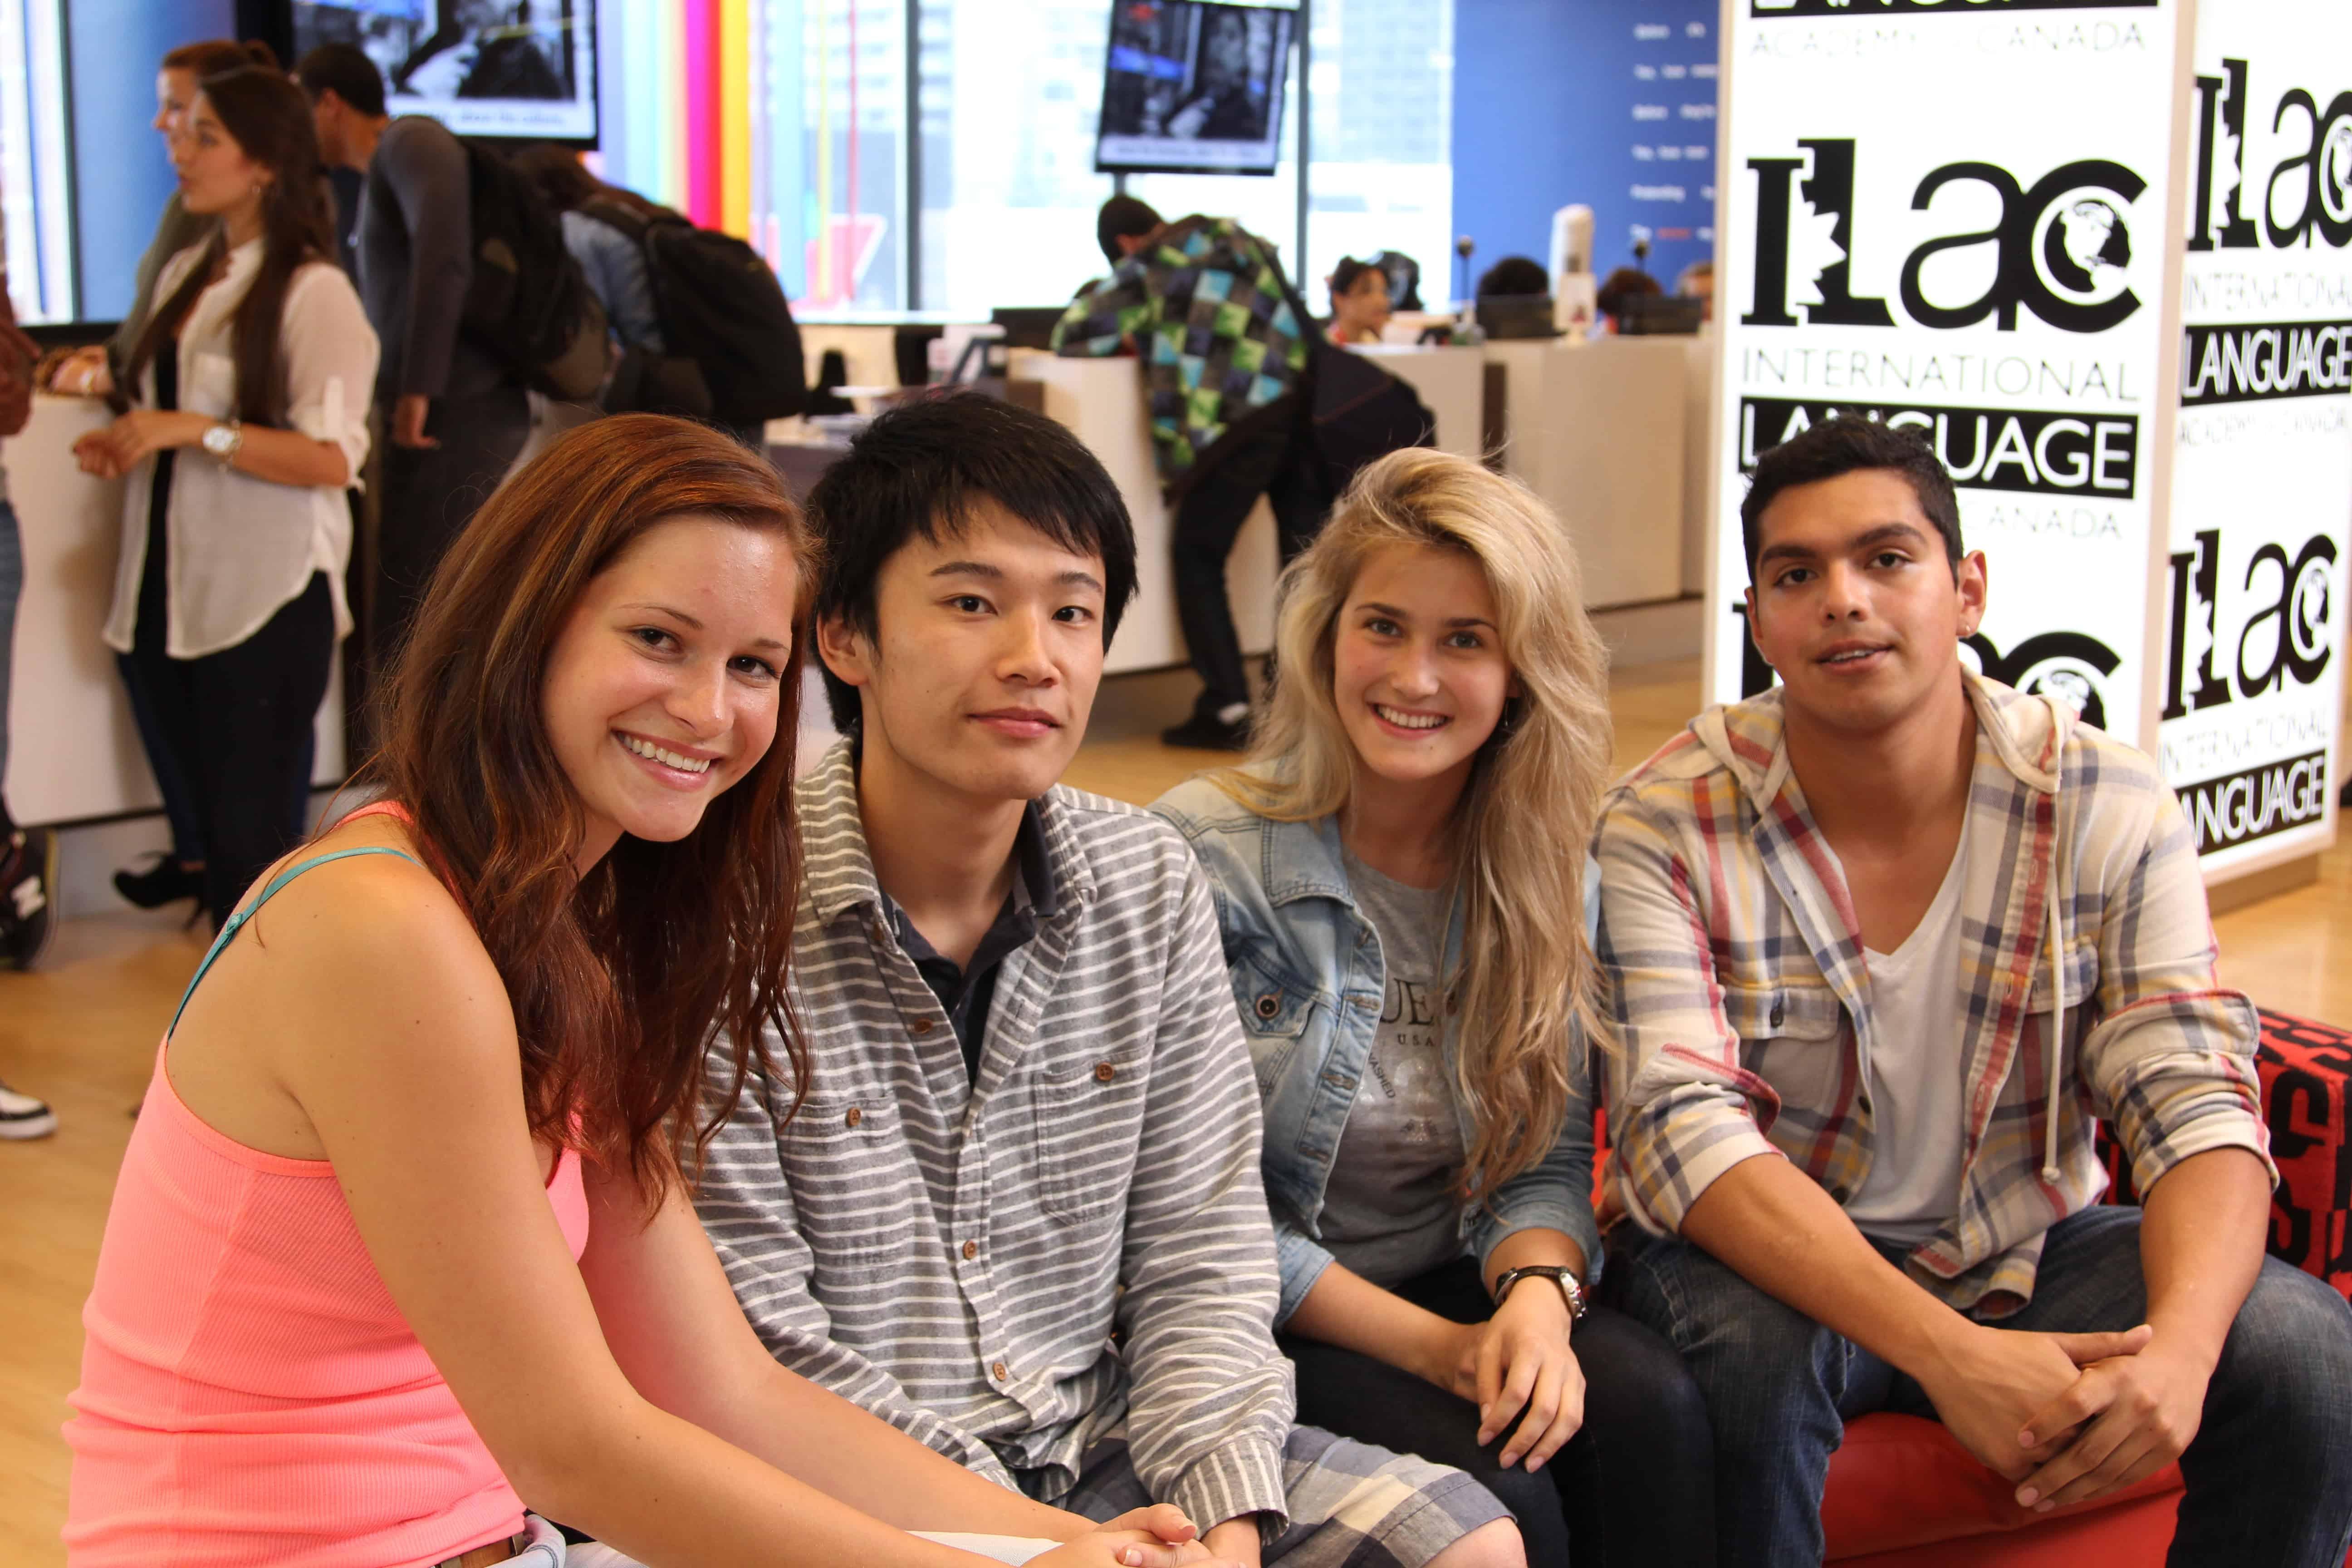 ilac-vancouver-5